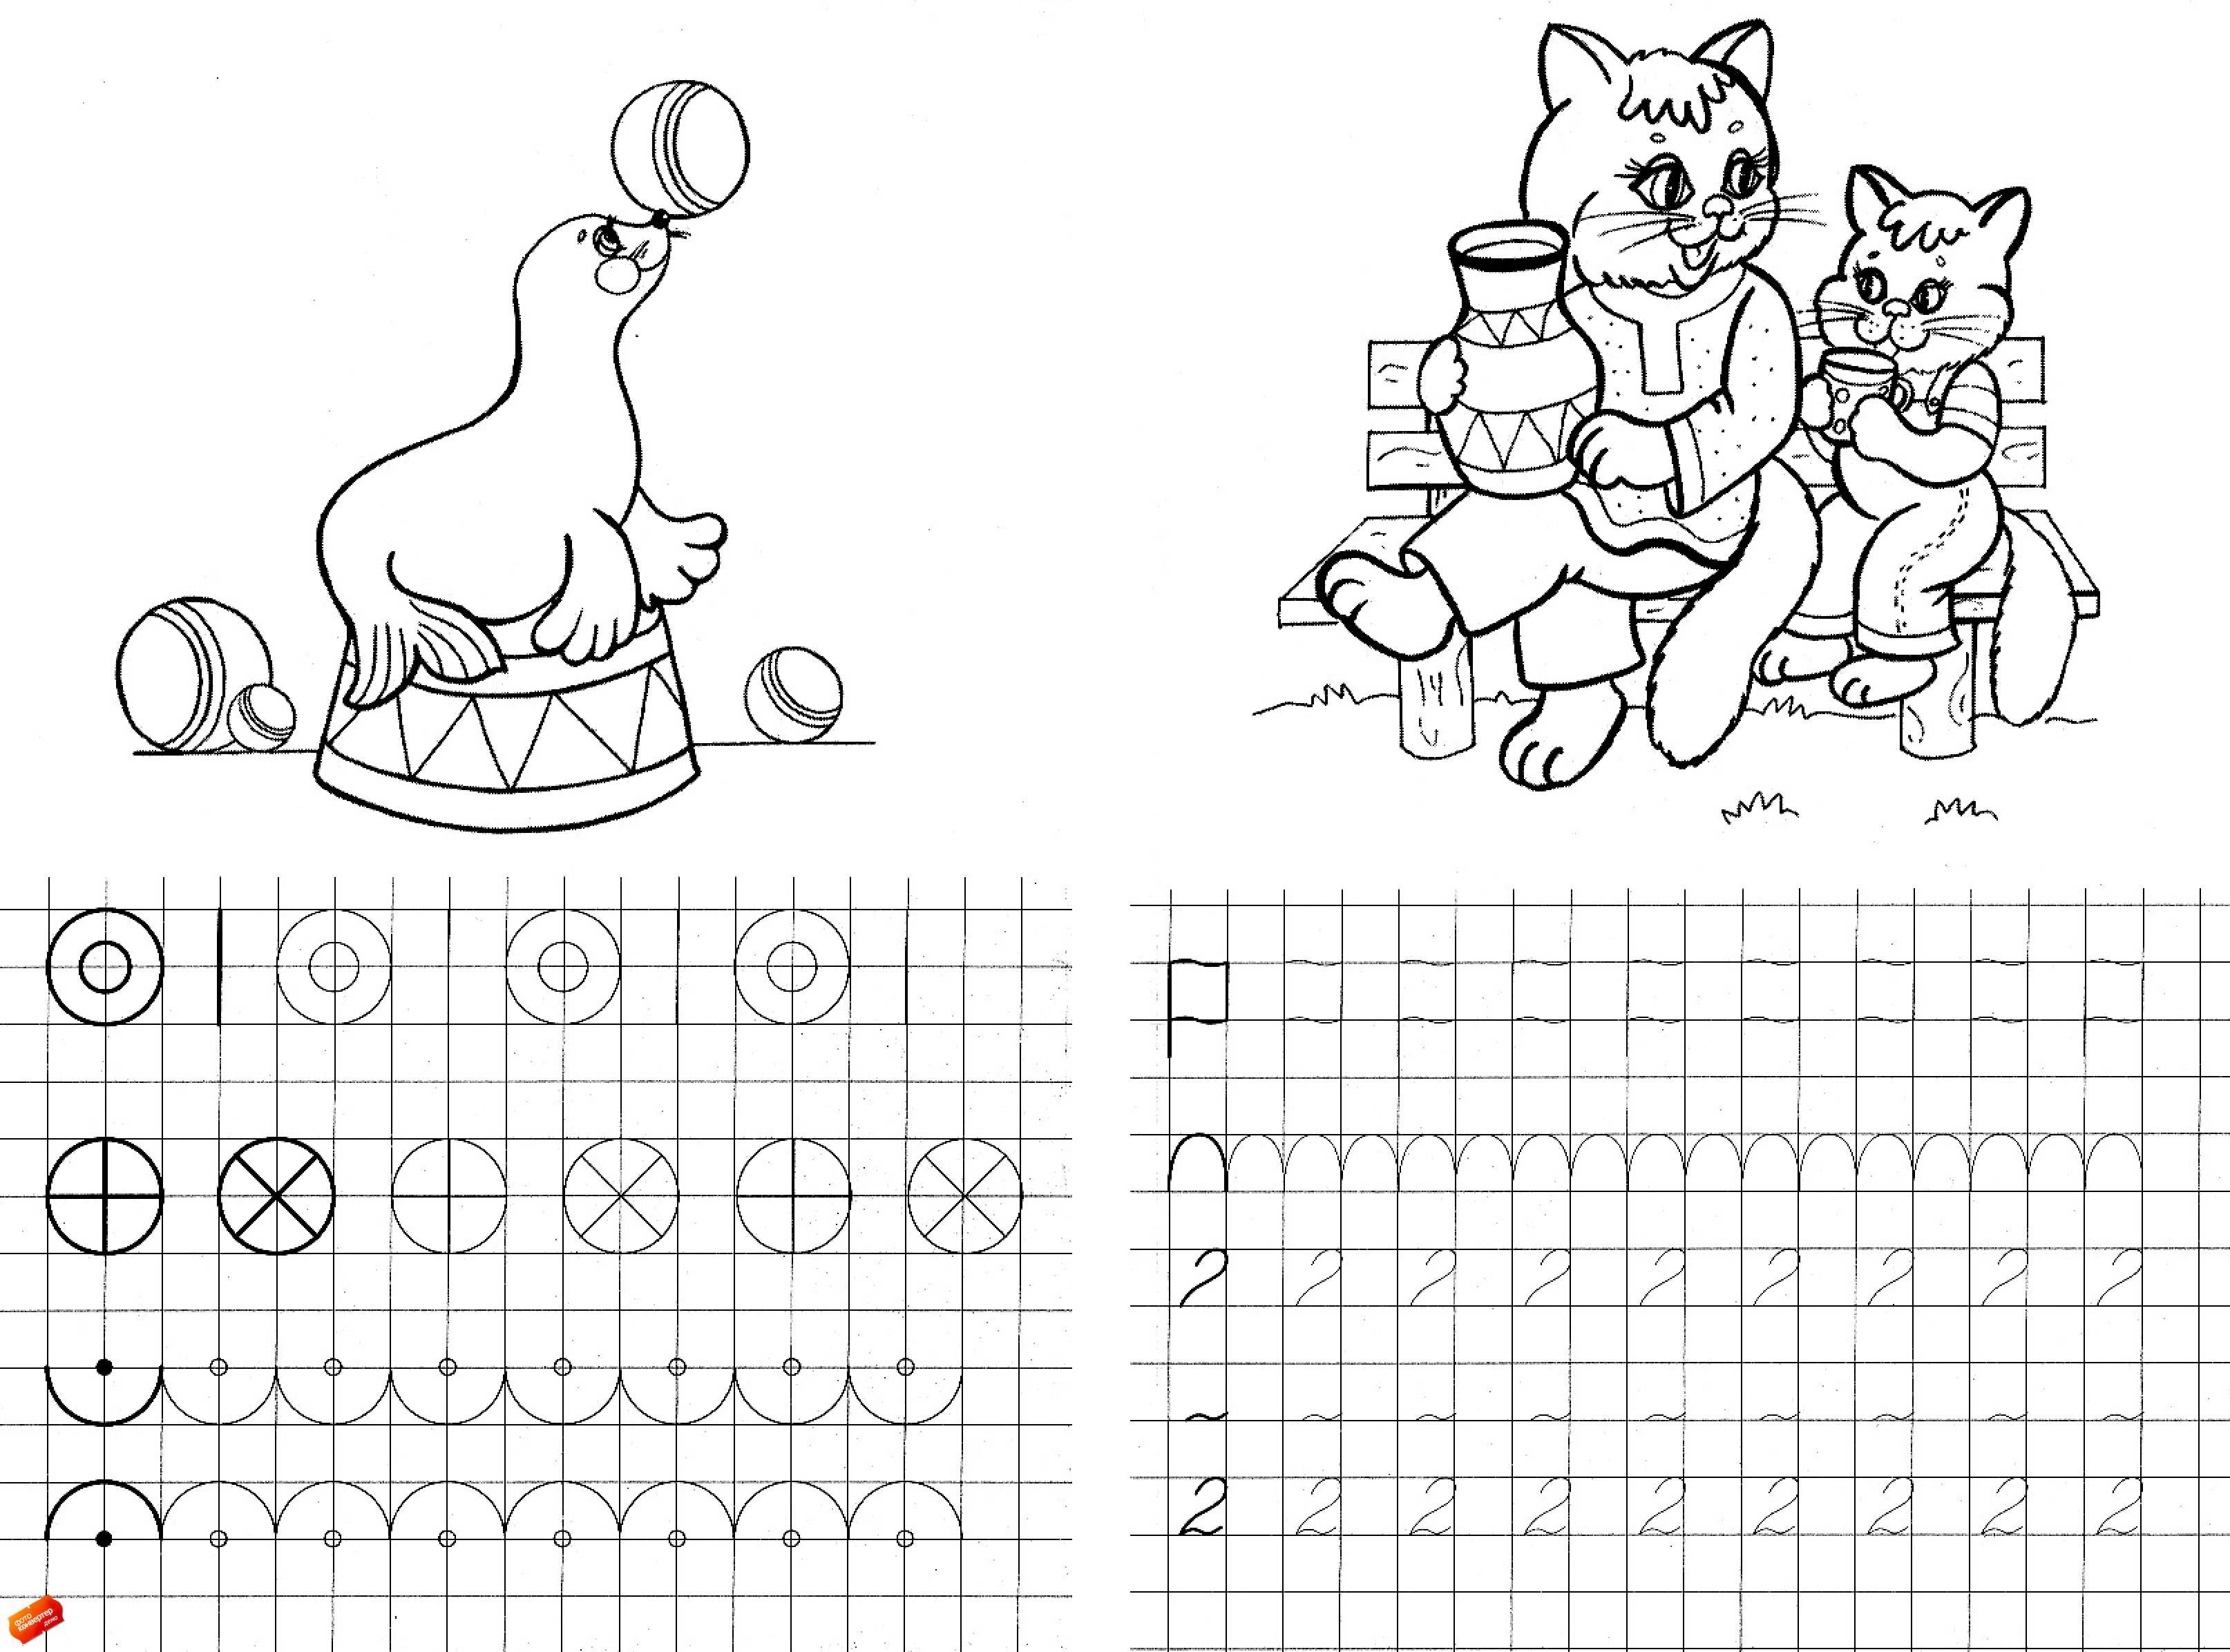 Прописи цифра 2, раскраски два котенка на лавочке, тюлень в цирке играет с мячиками